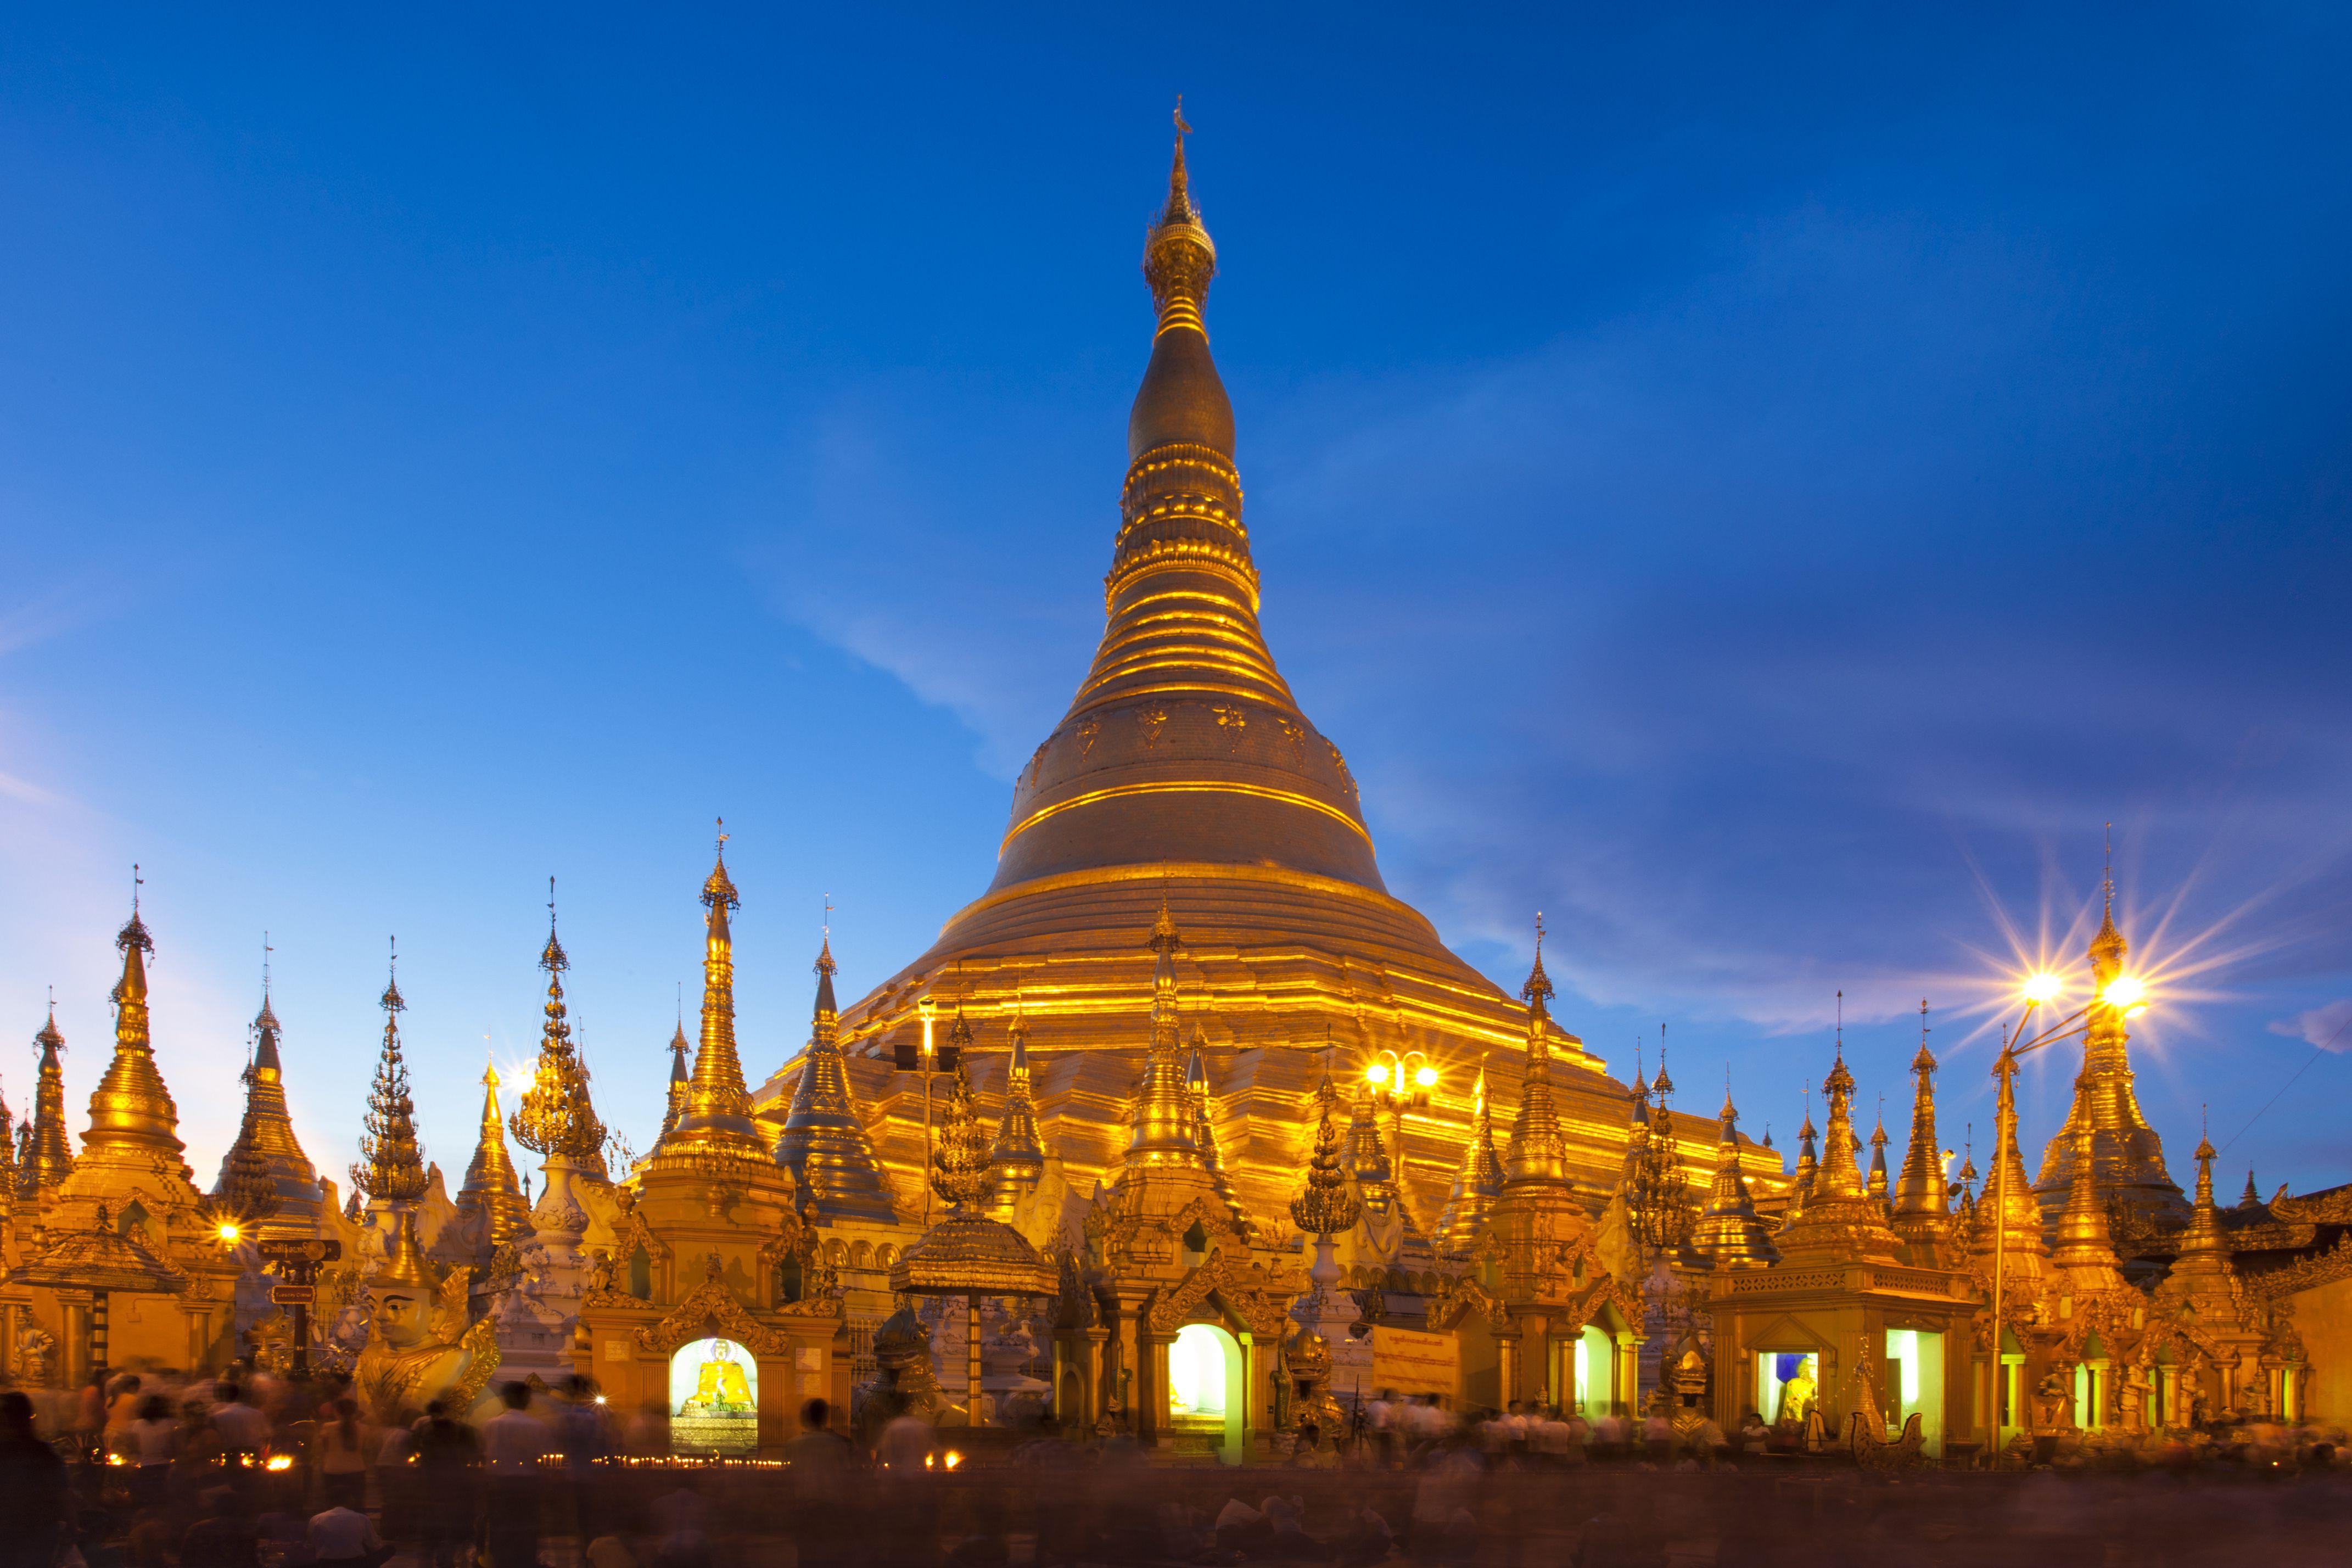 Shwedagon Pagoda at sunset, Yagon, Myanmar